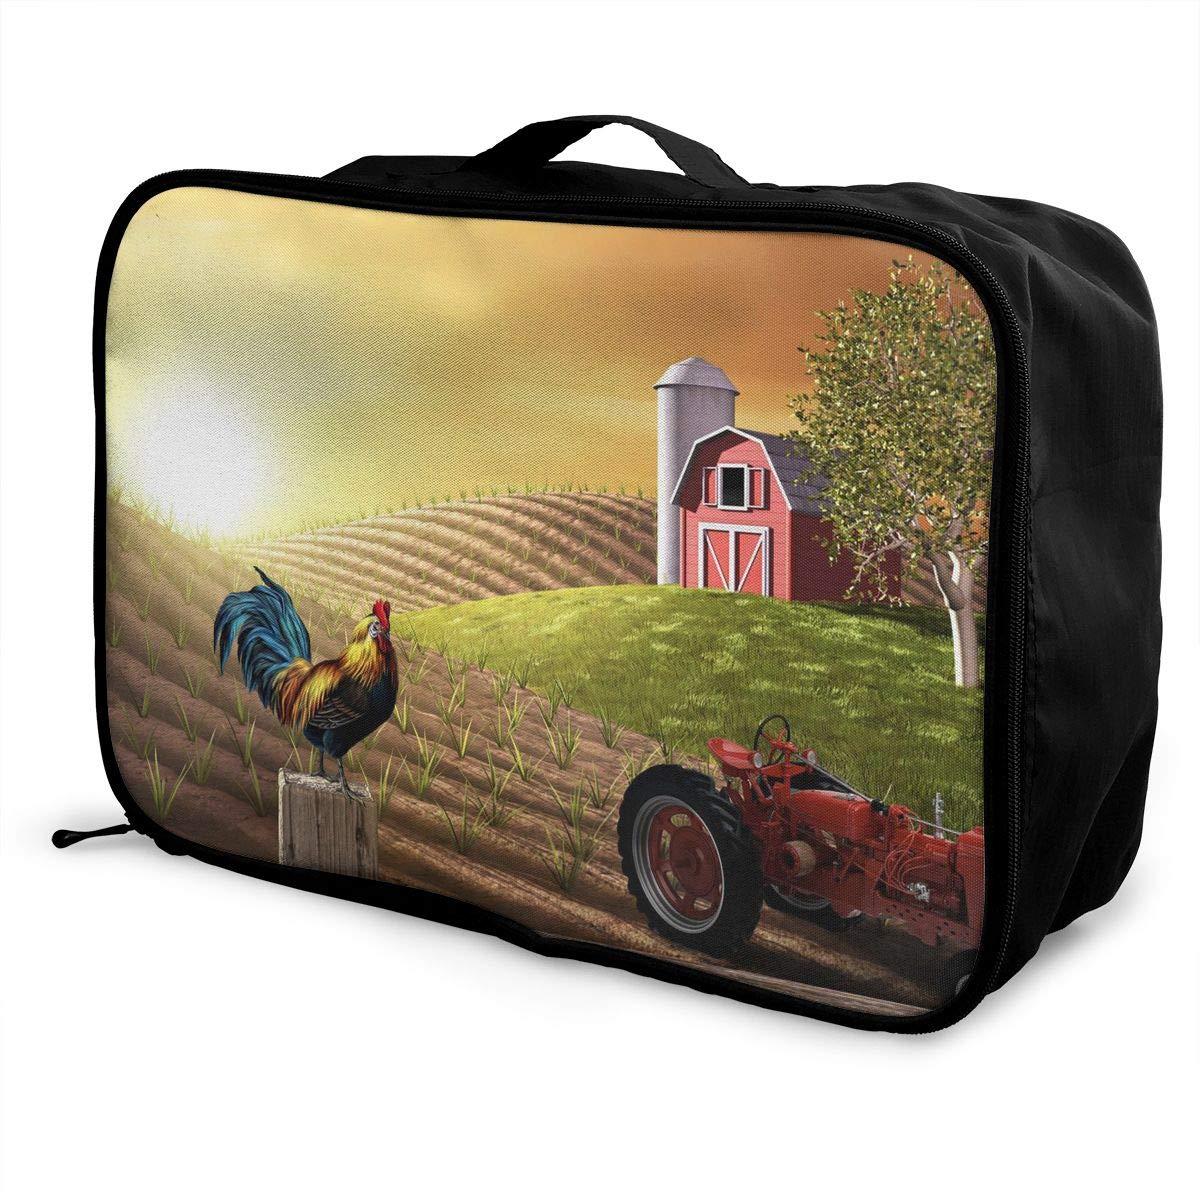 Travel Luggage Duffle Bag Lightweight Portable Handbag Morning Of Farm Large Capacity Waterproof Foldable Storage Tote